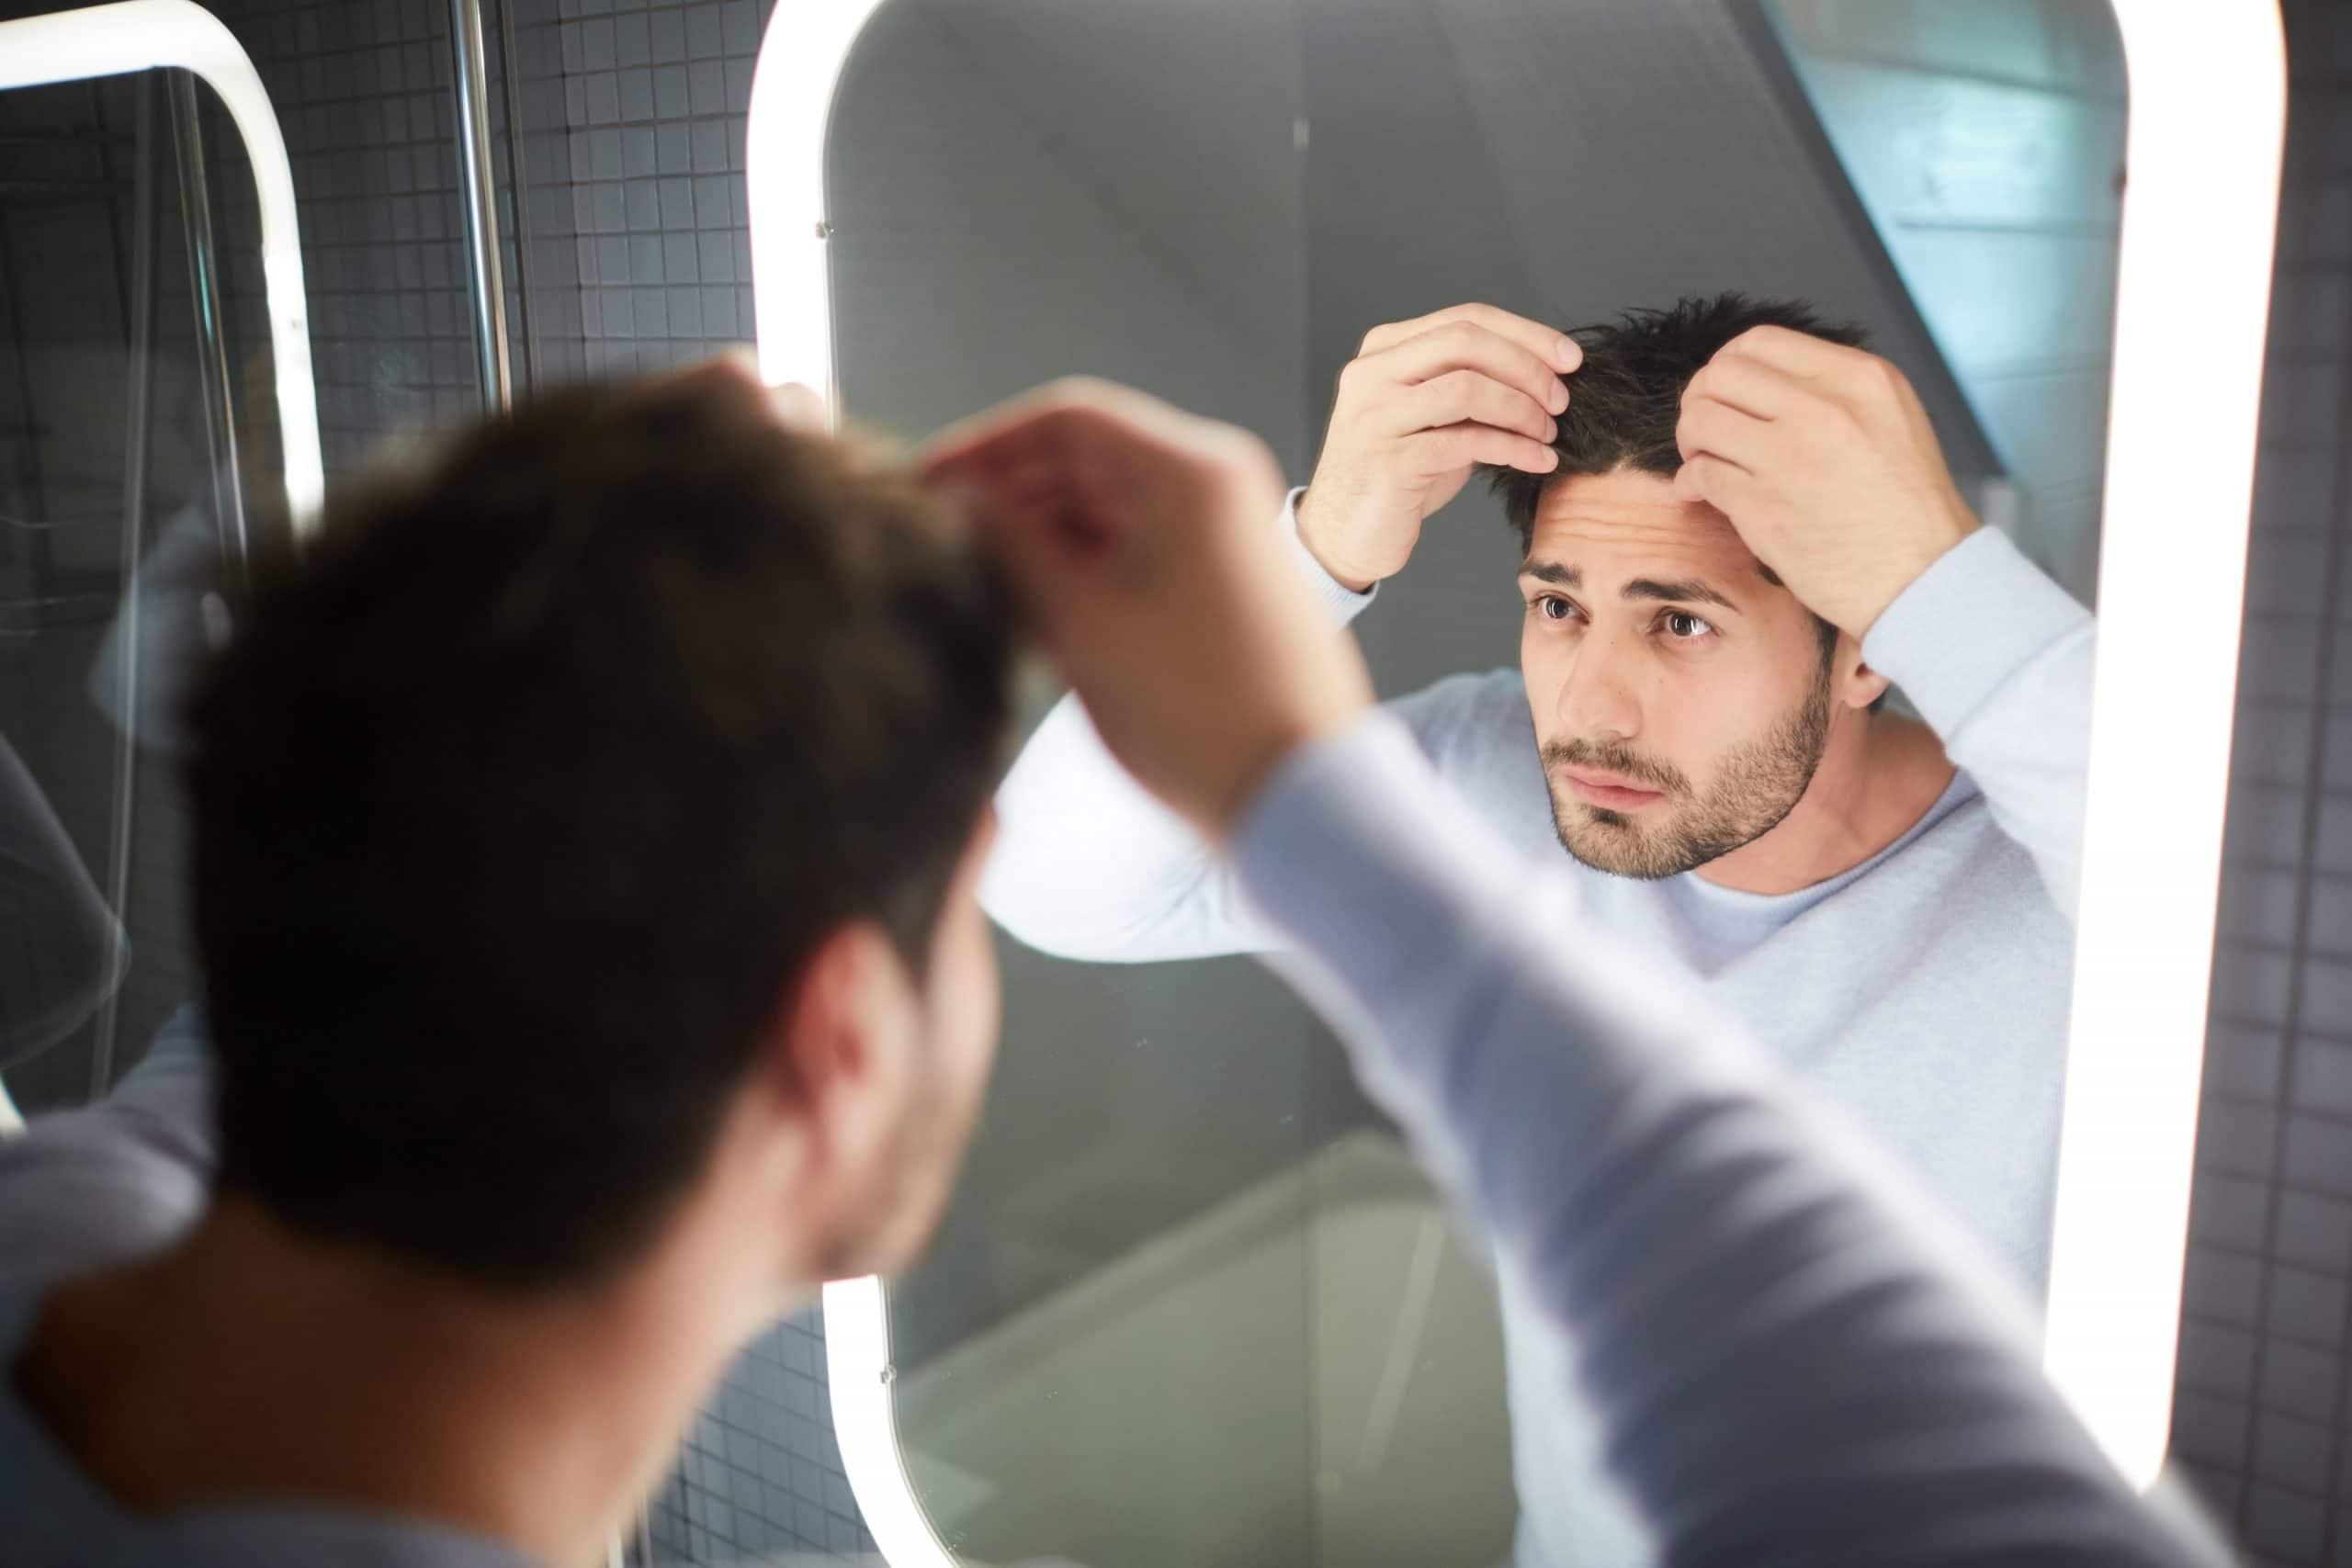 Hair Loss Treatments in South Korea